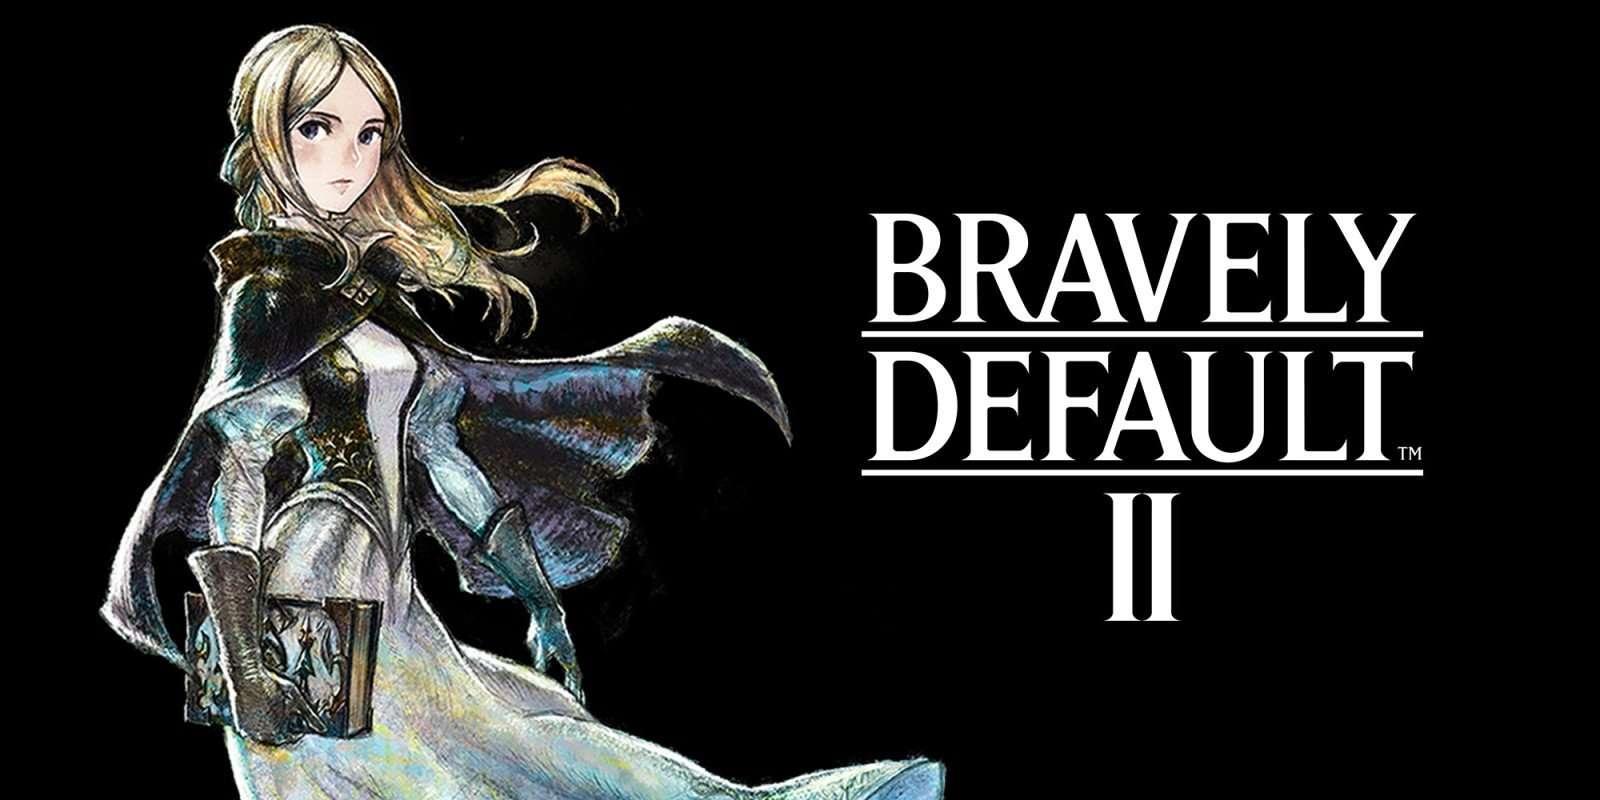 1441b775217b1c146325d7dfb664c09d - عرض و صور جديدة للعبة Bravely Default II